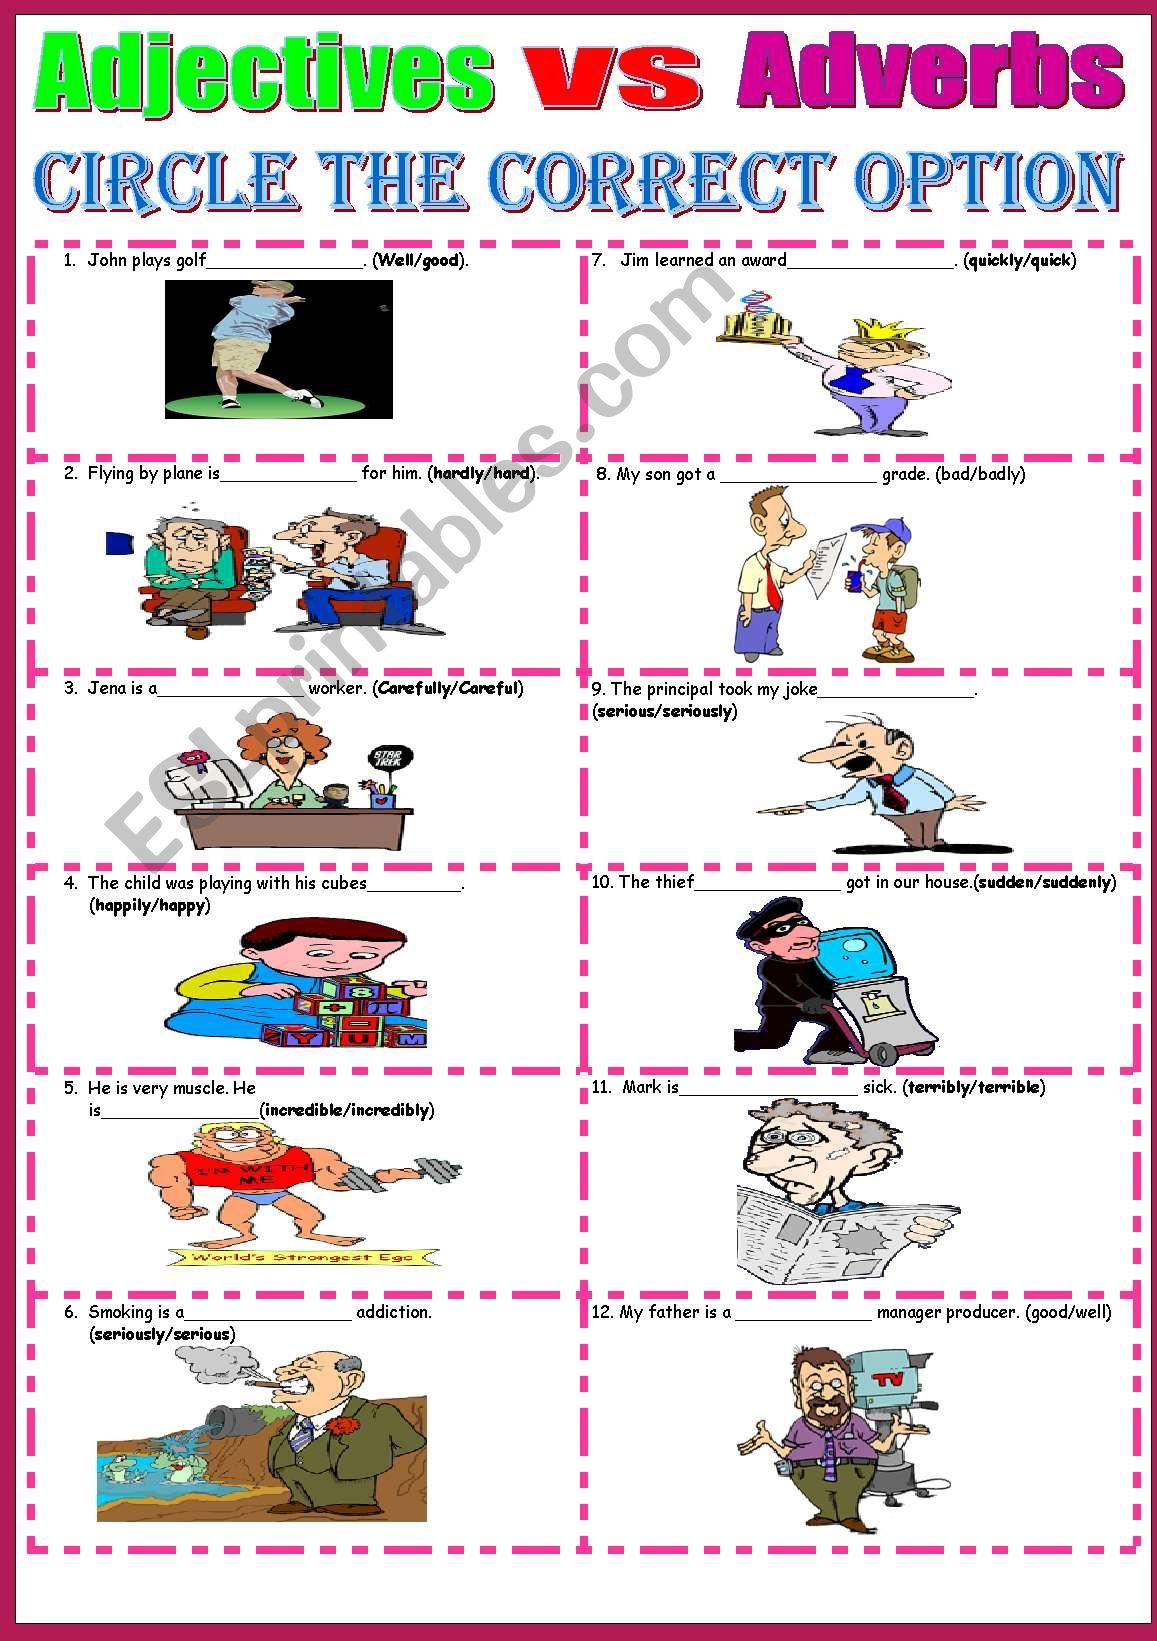 Adverbs Vs Adjectives